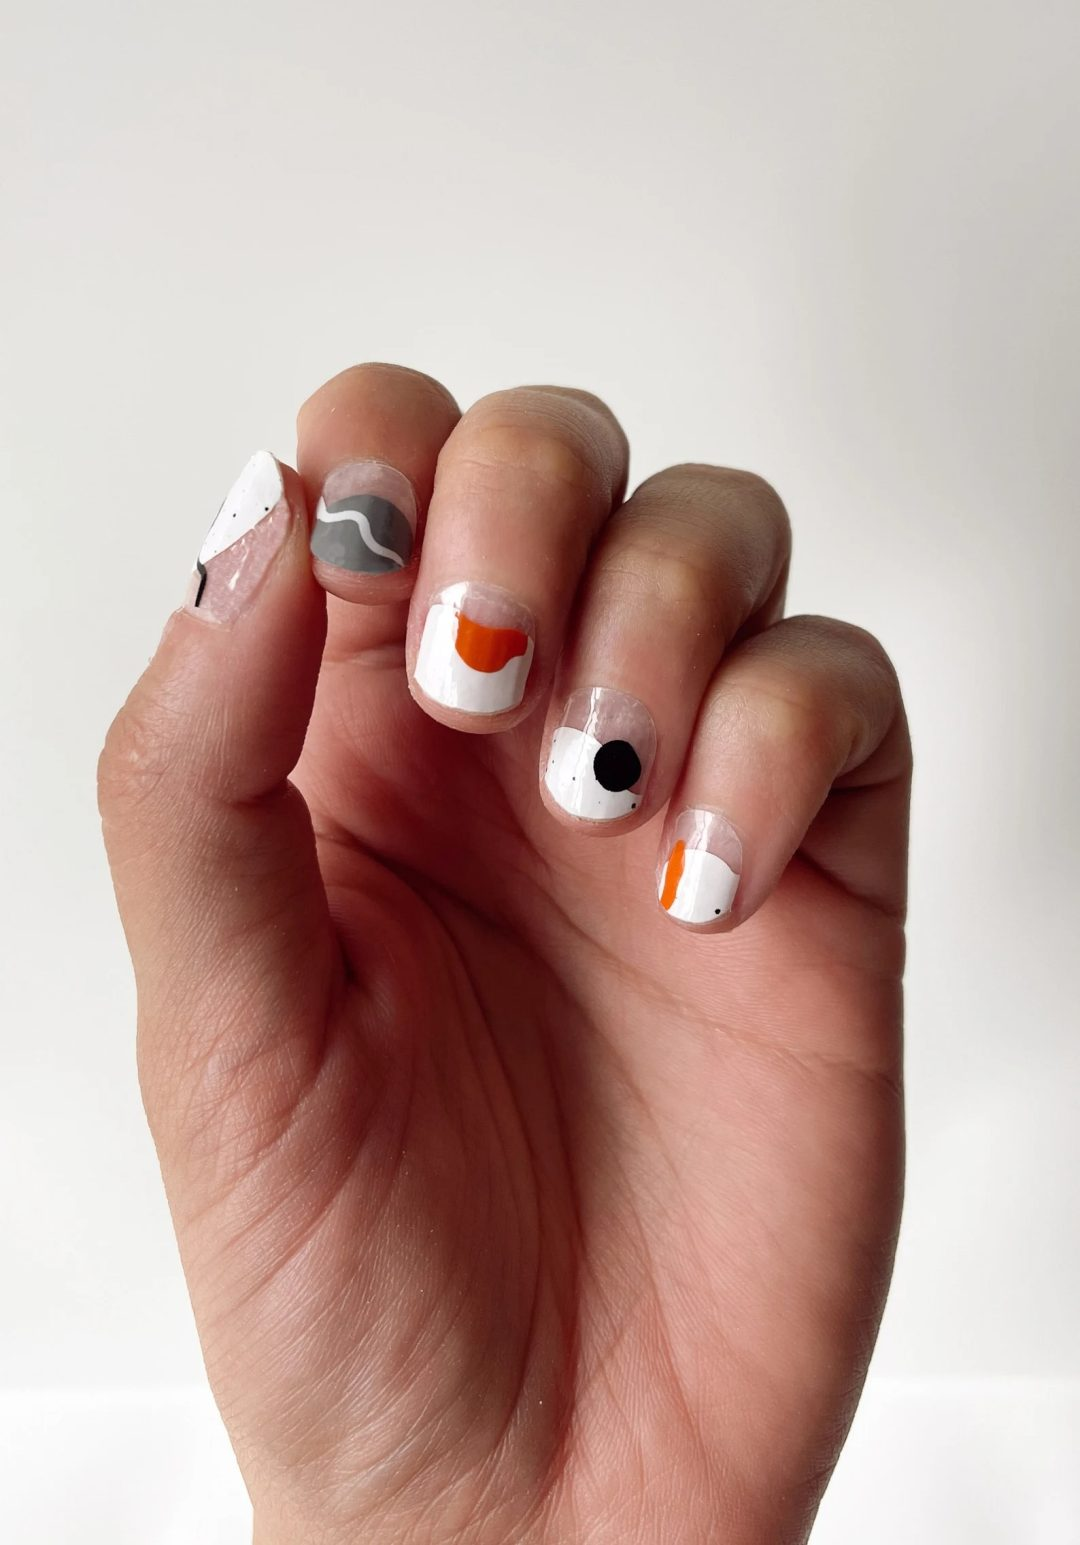 Minimalist abstract nails